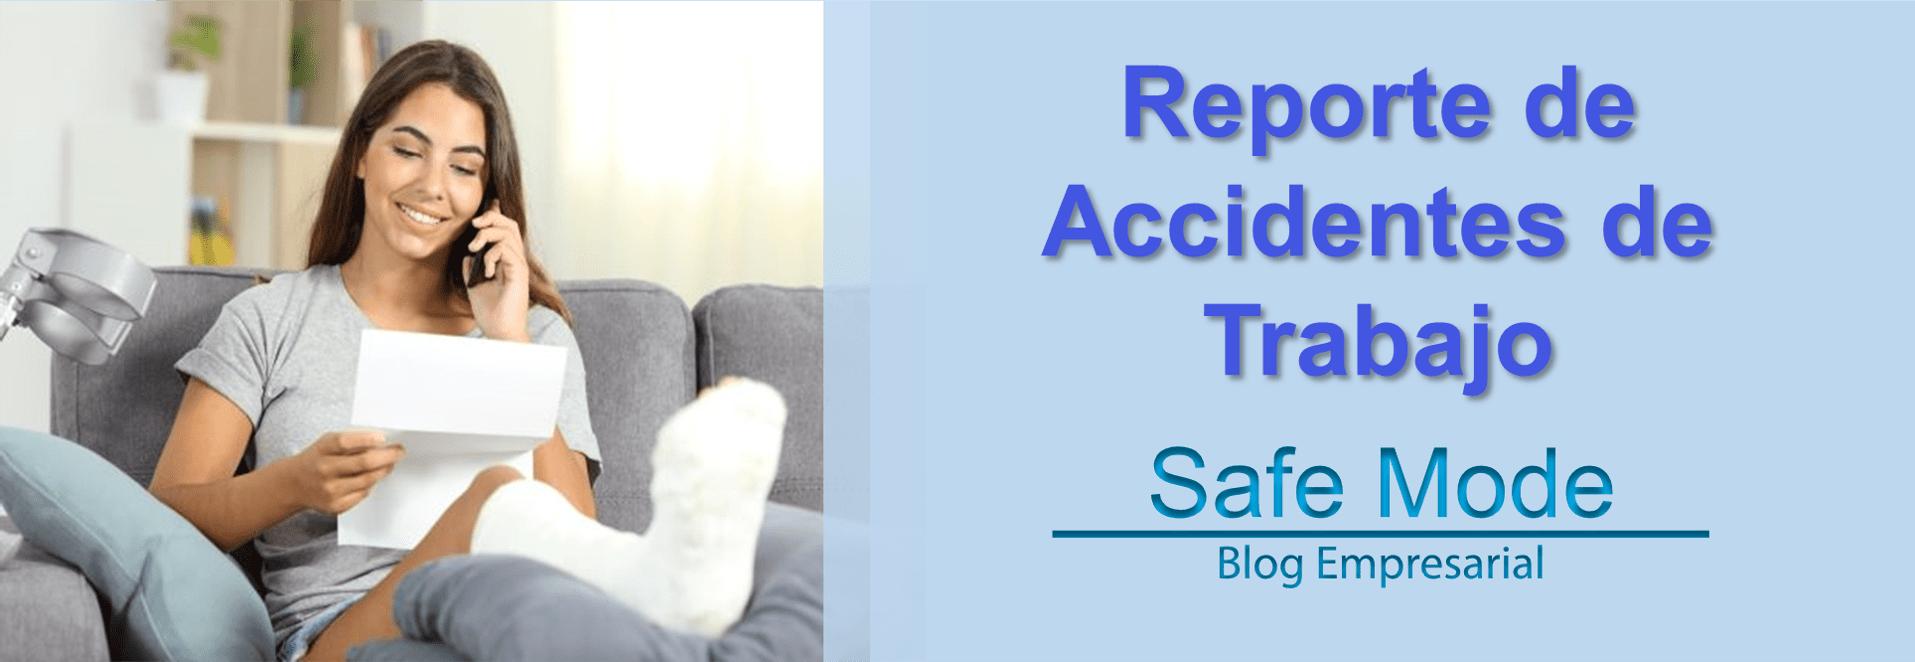 Reporte de AT o Accidentes de trabajo